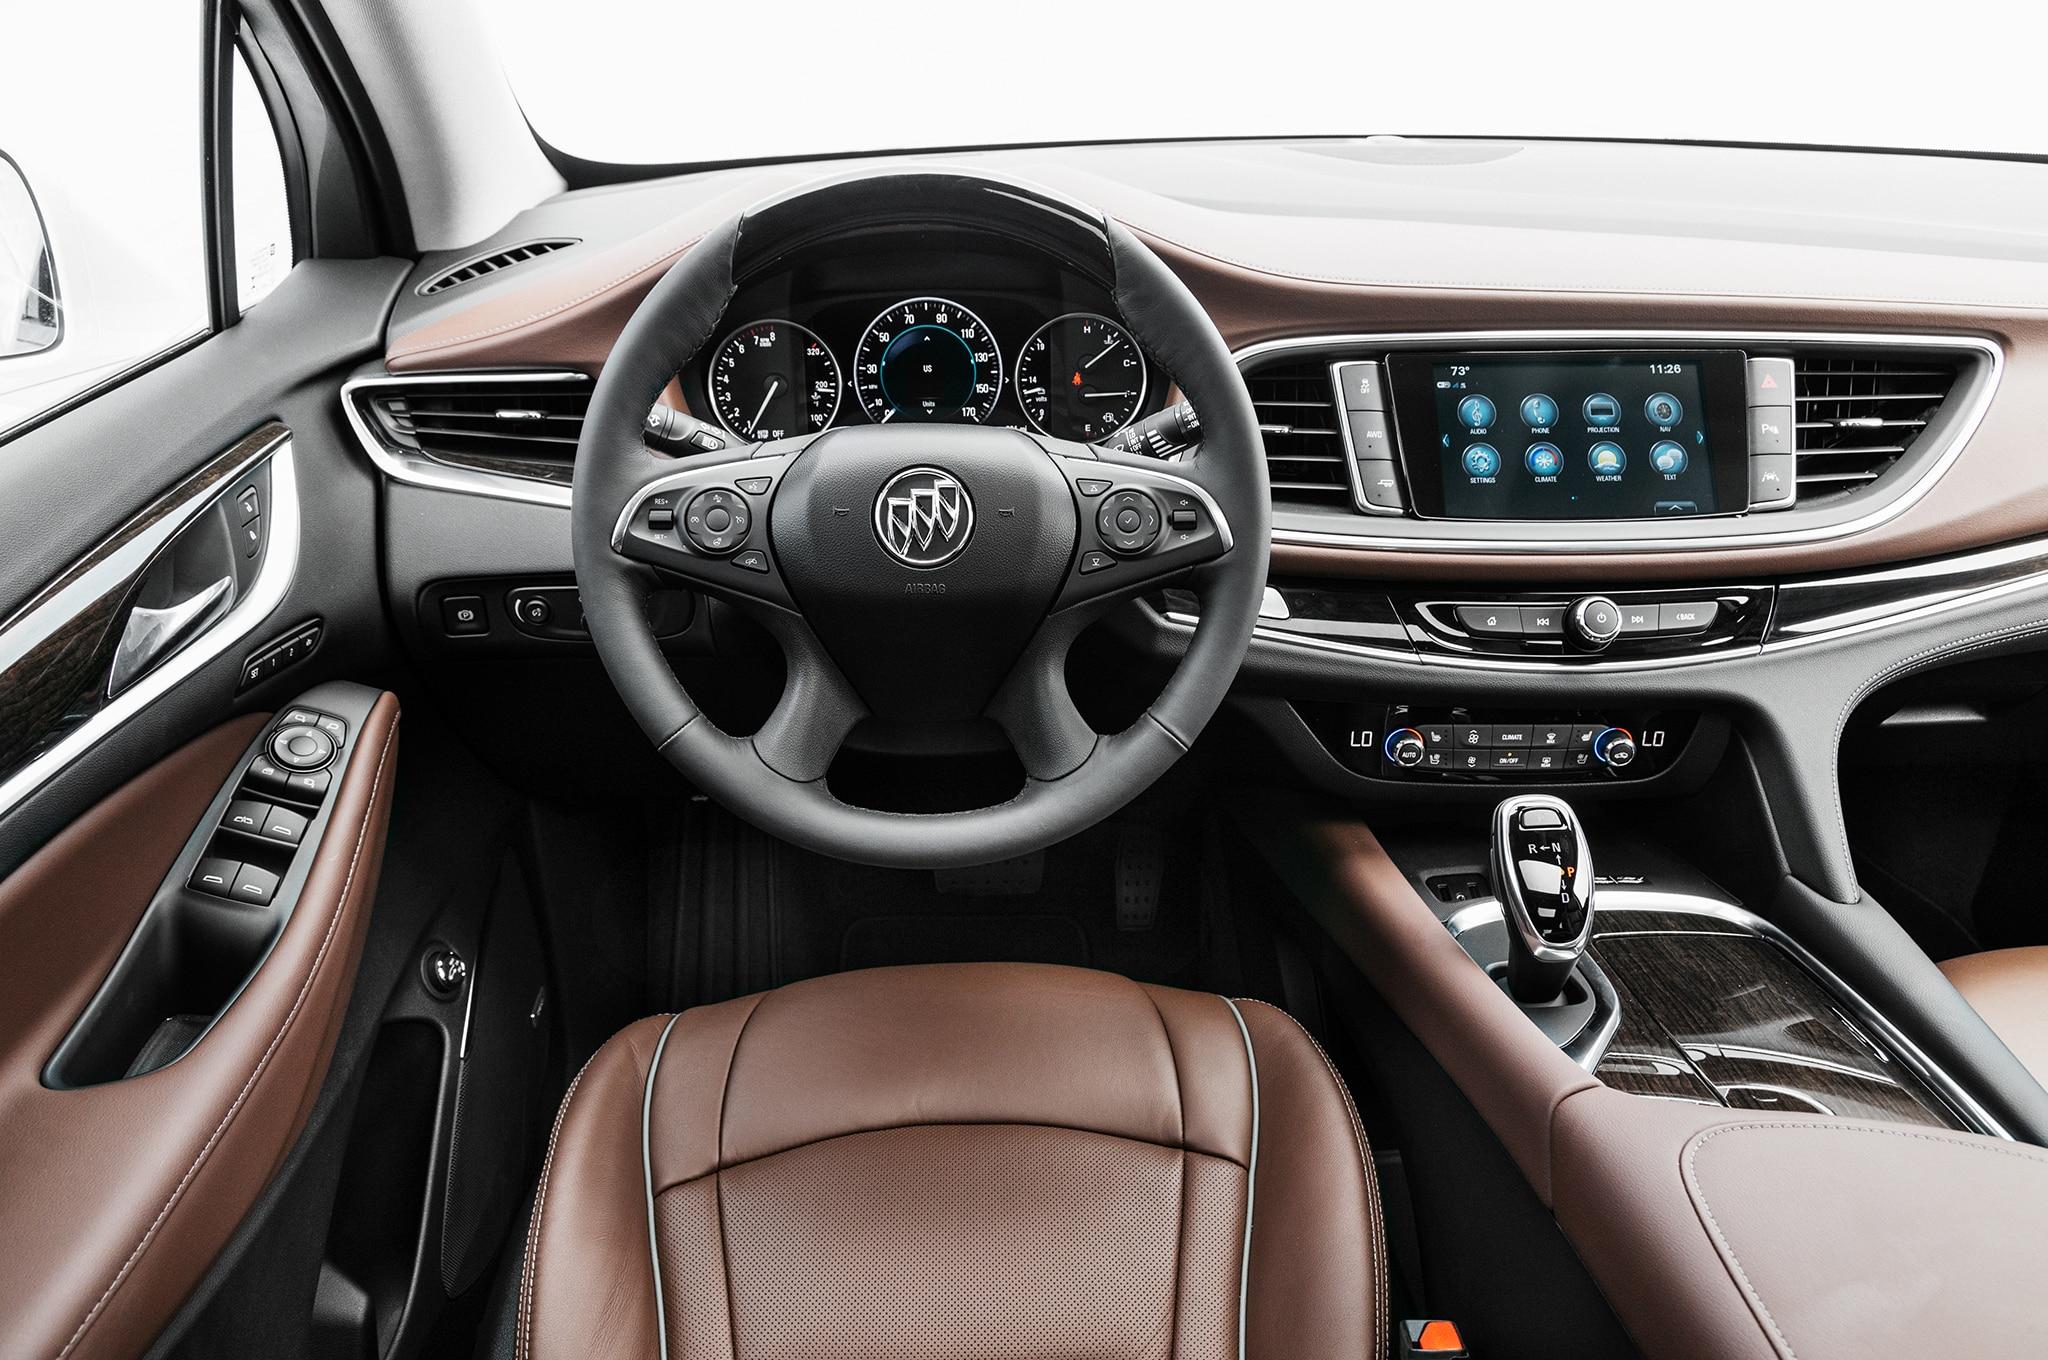 2018 Buick Enclave AWD Avenir dashboard - Motor Trend en Español